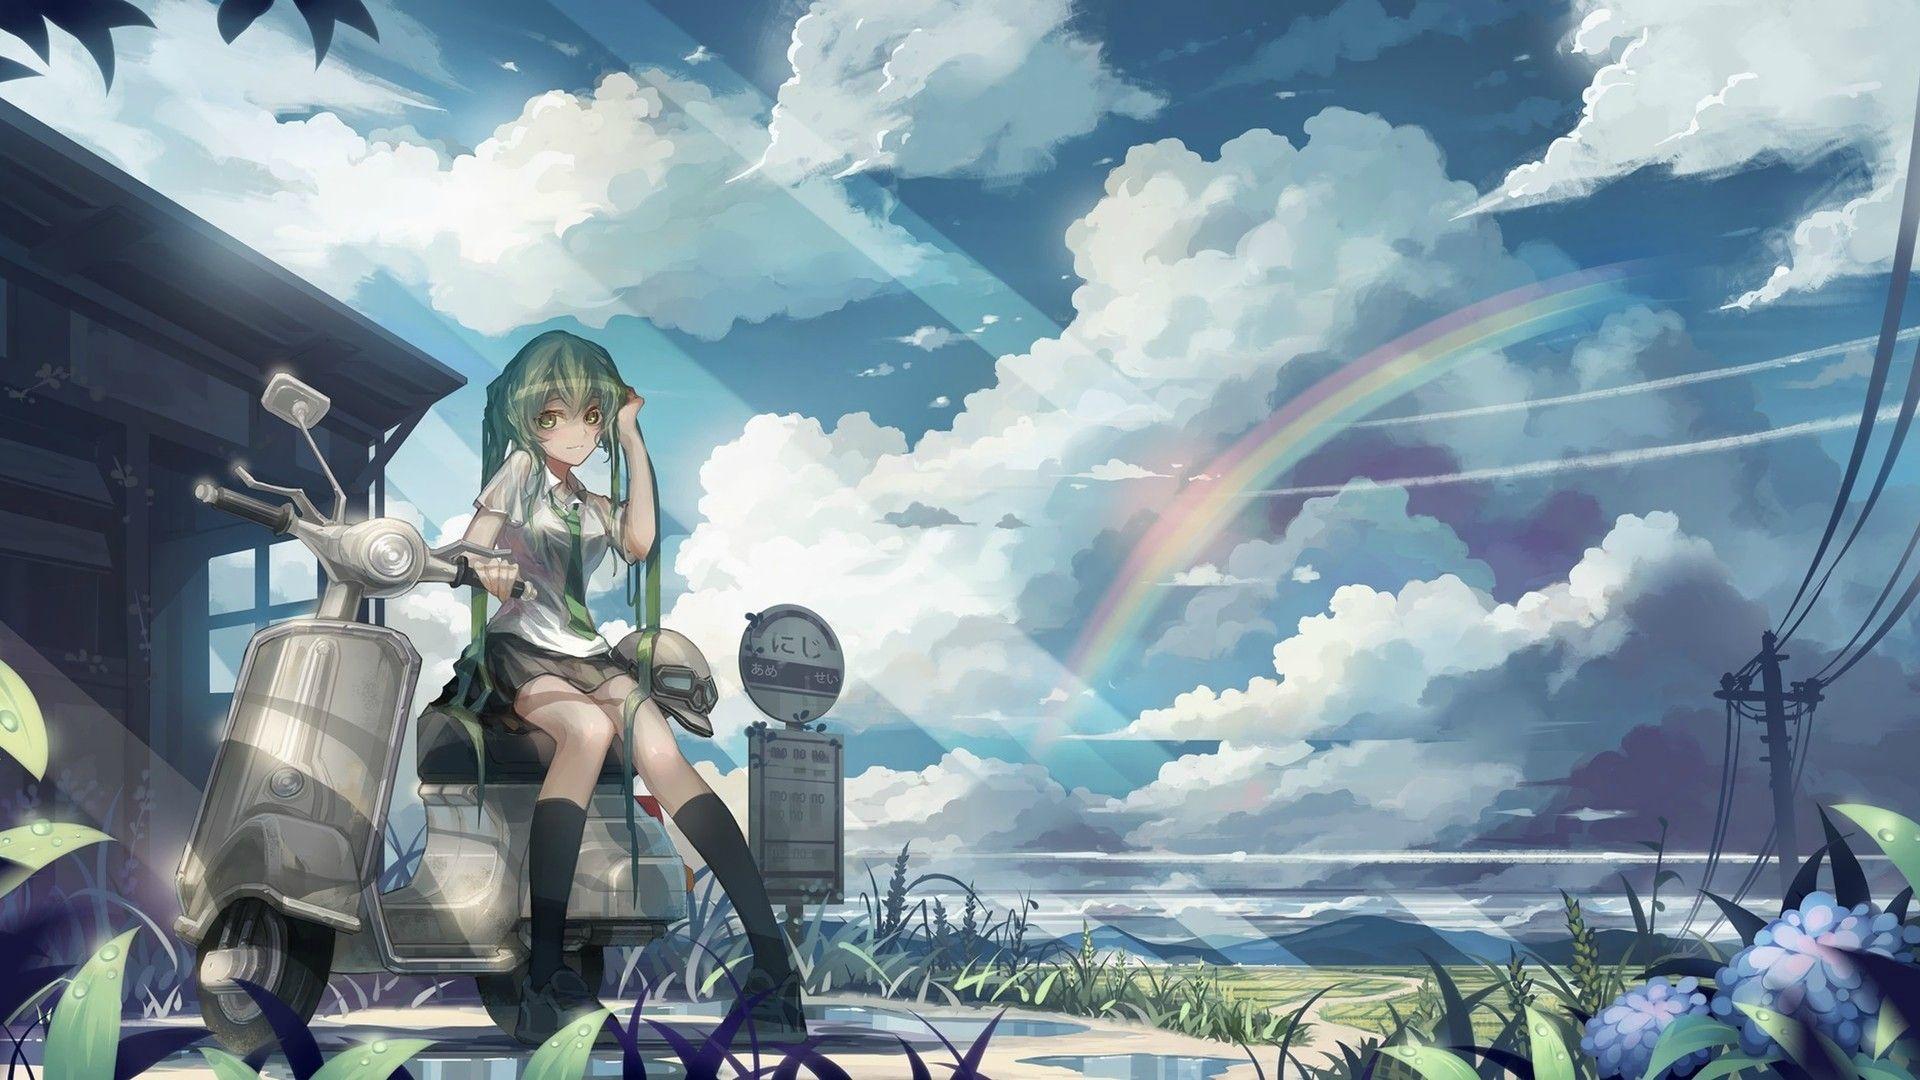 Epingle Par Stitis Sur Anime Wallpaper Hd Pinterest Anime